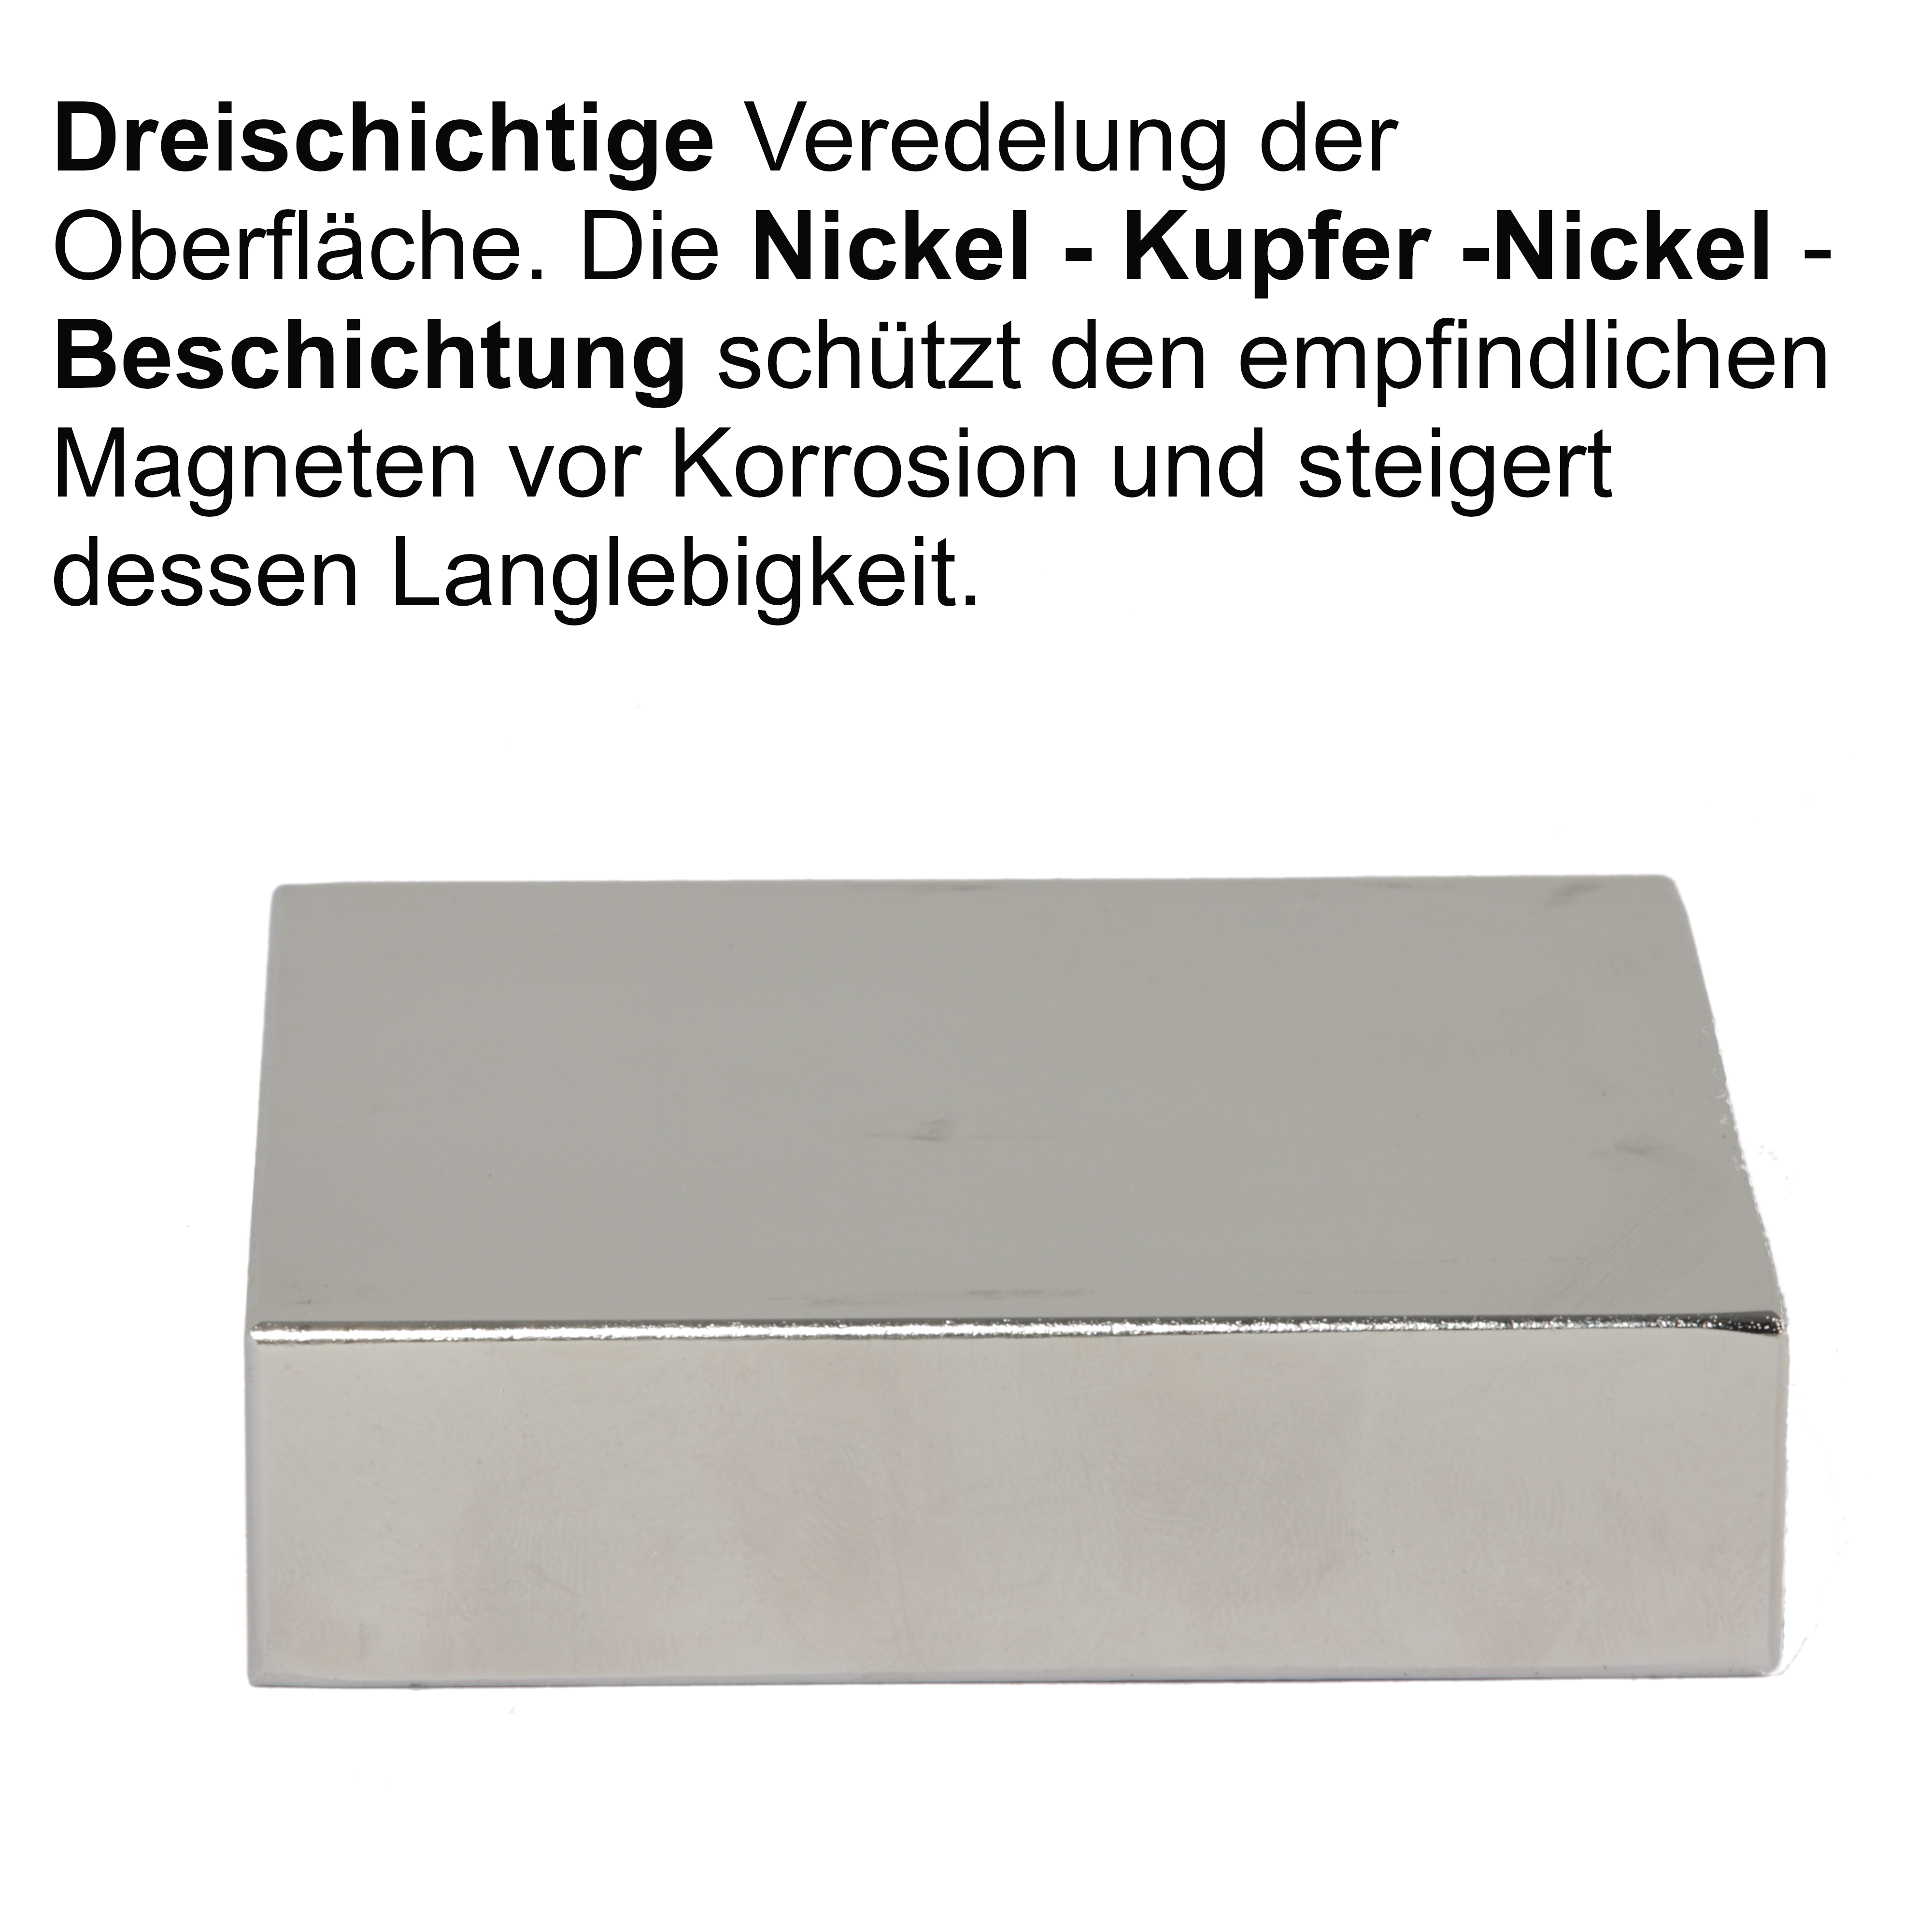 2 x Neodym Magnet Quader 100x100x10mm N45 super stark 400 KG Power groß NdFeB